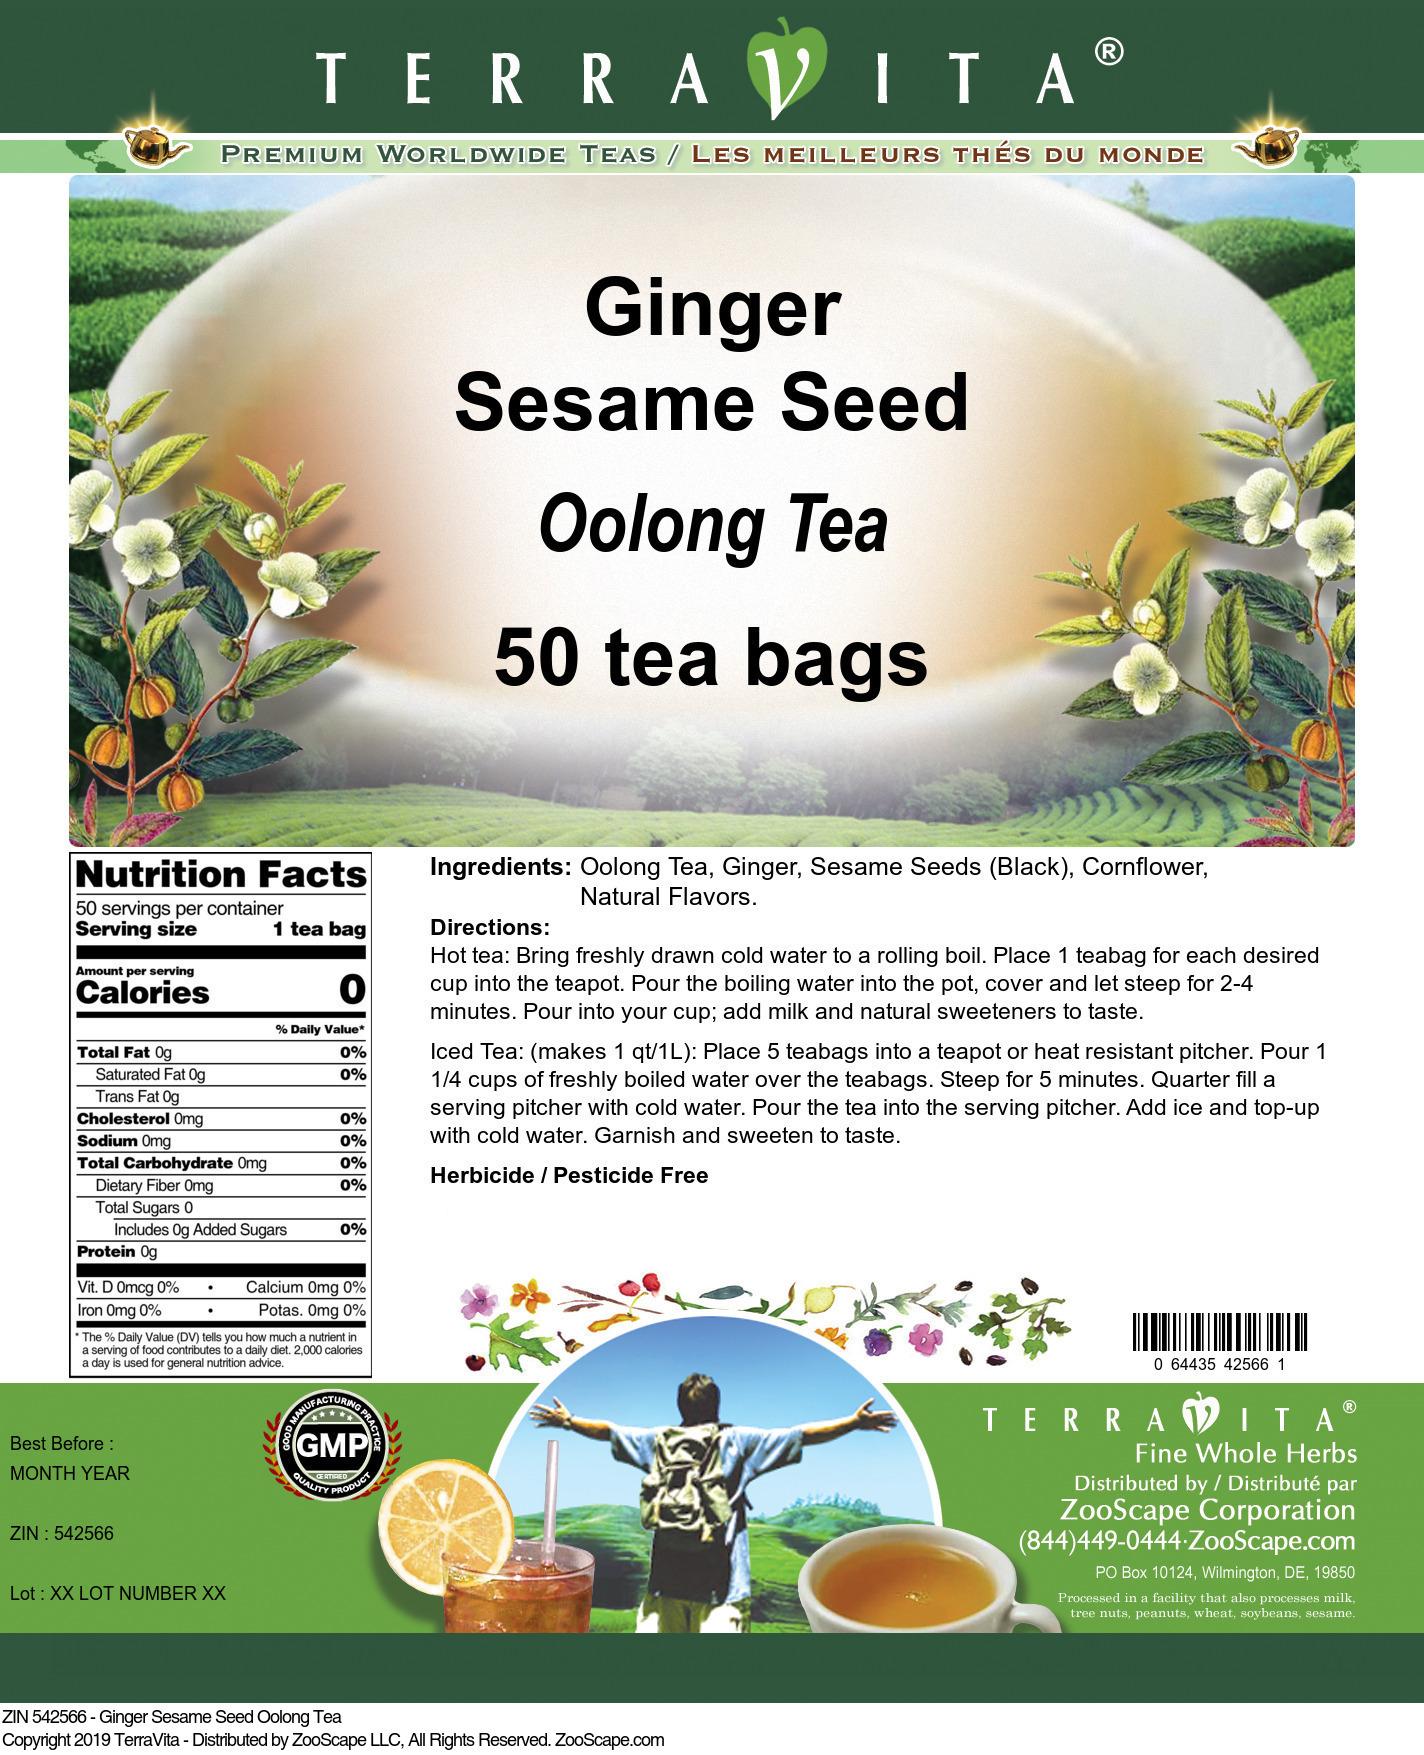 Ginger Sesame Seed Oolong Tea